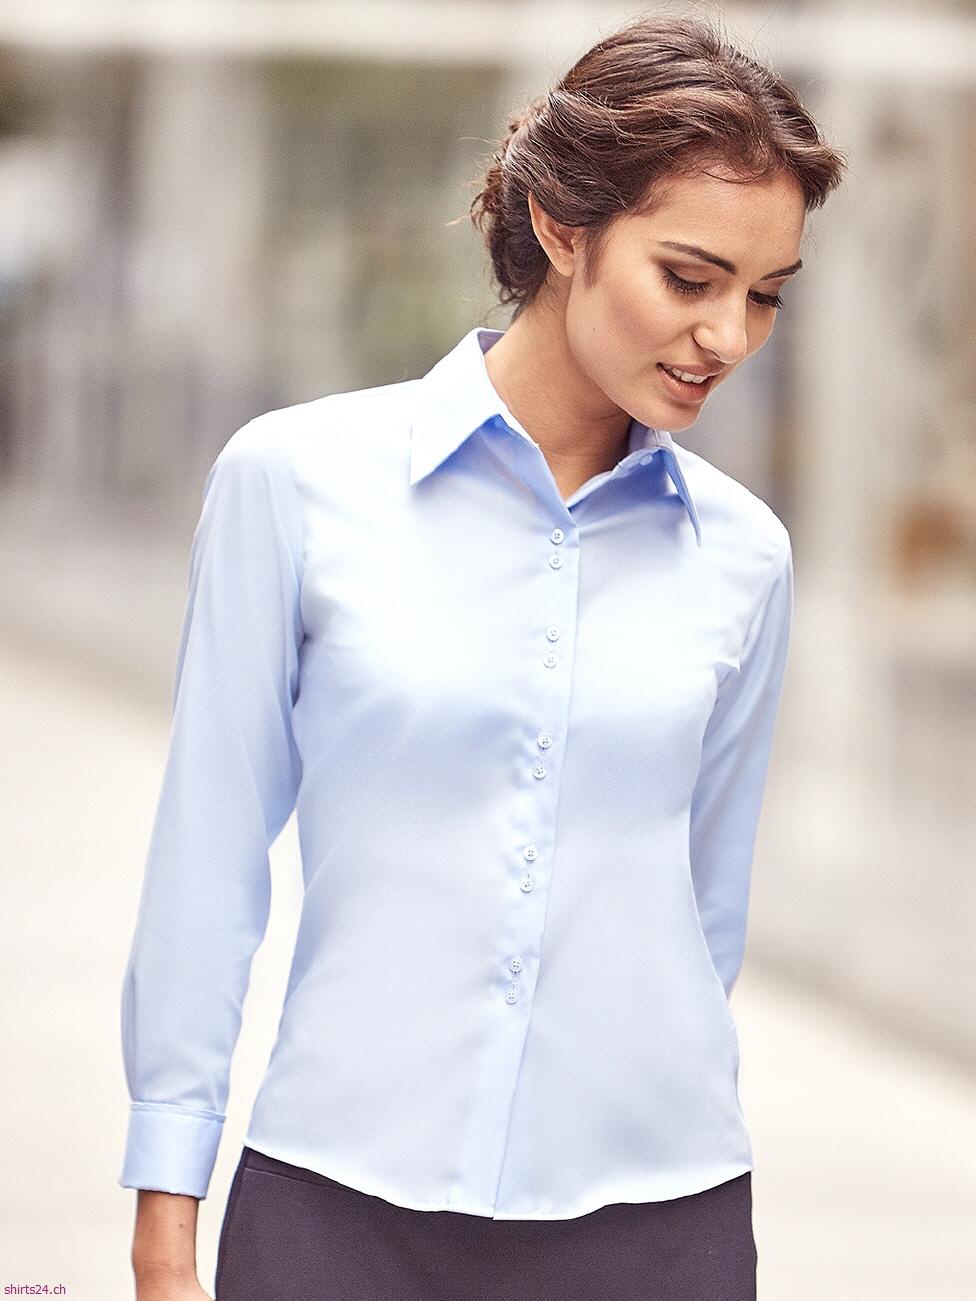 www.shirts24.ch für günstige Shirts Blusen Hemden Fleece SoftShell ... bcd467ae90